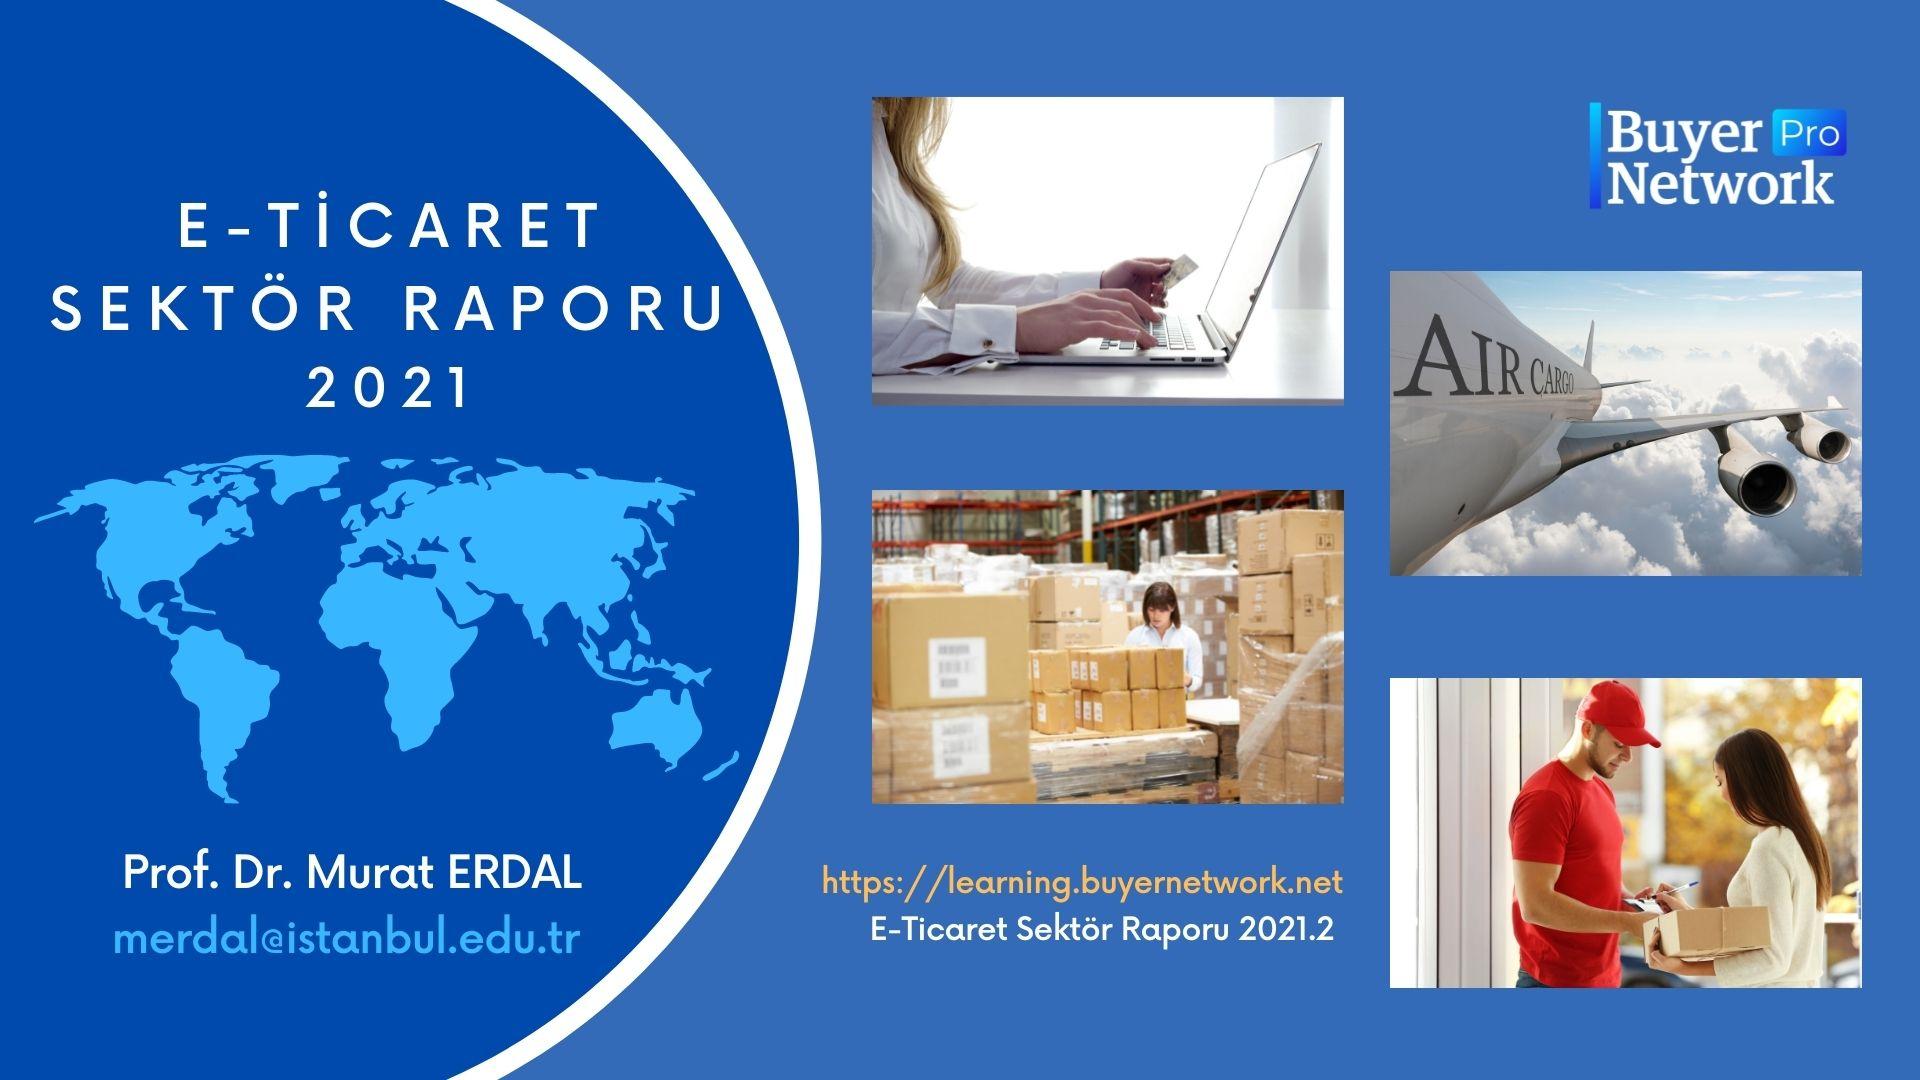 E-Ticaret Sektör Raporu